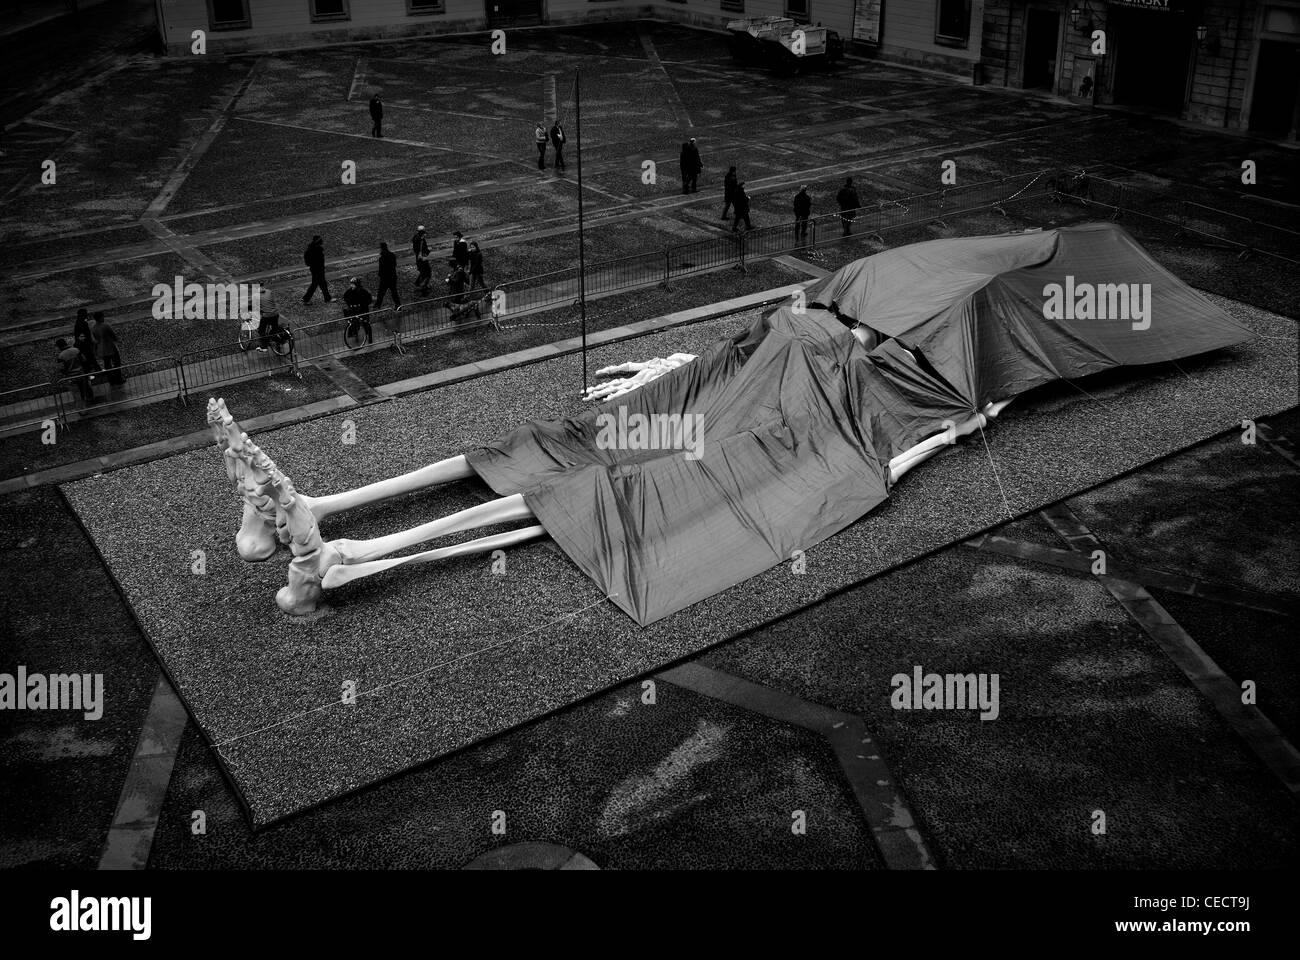 Milán, Italia. Esqueleto grande en plaza pública Imagen De Stock